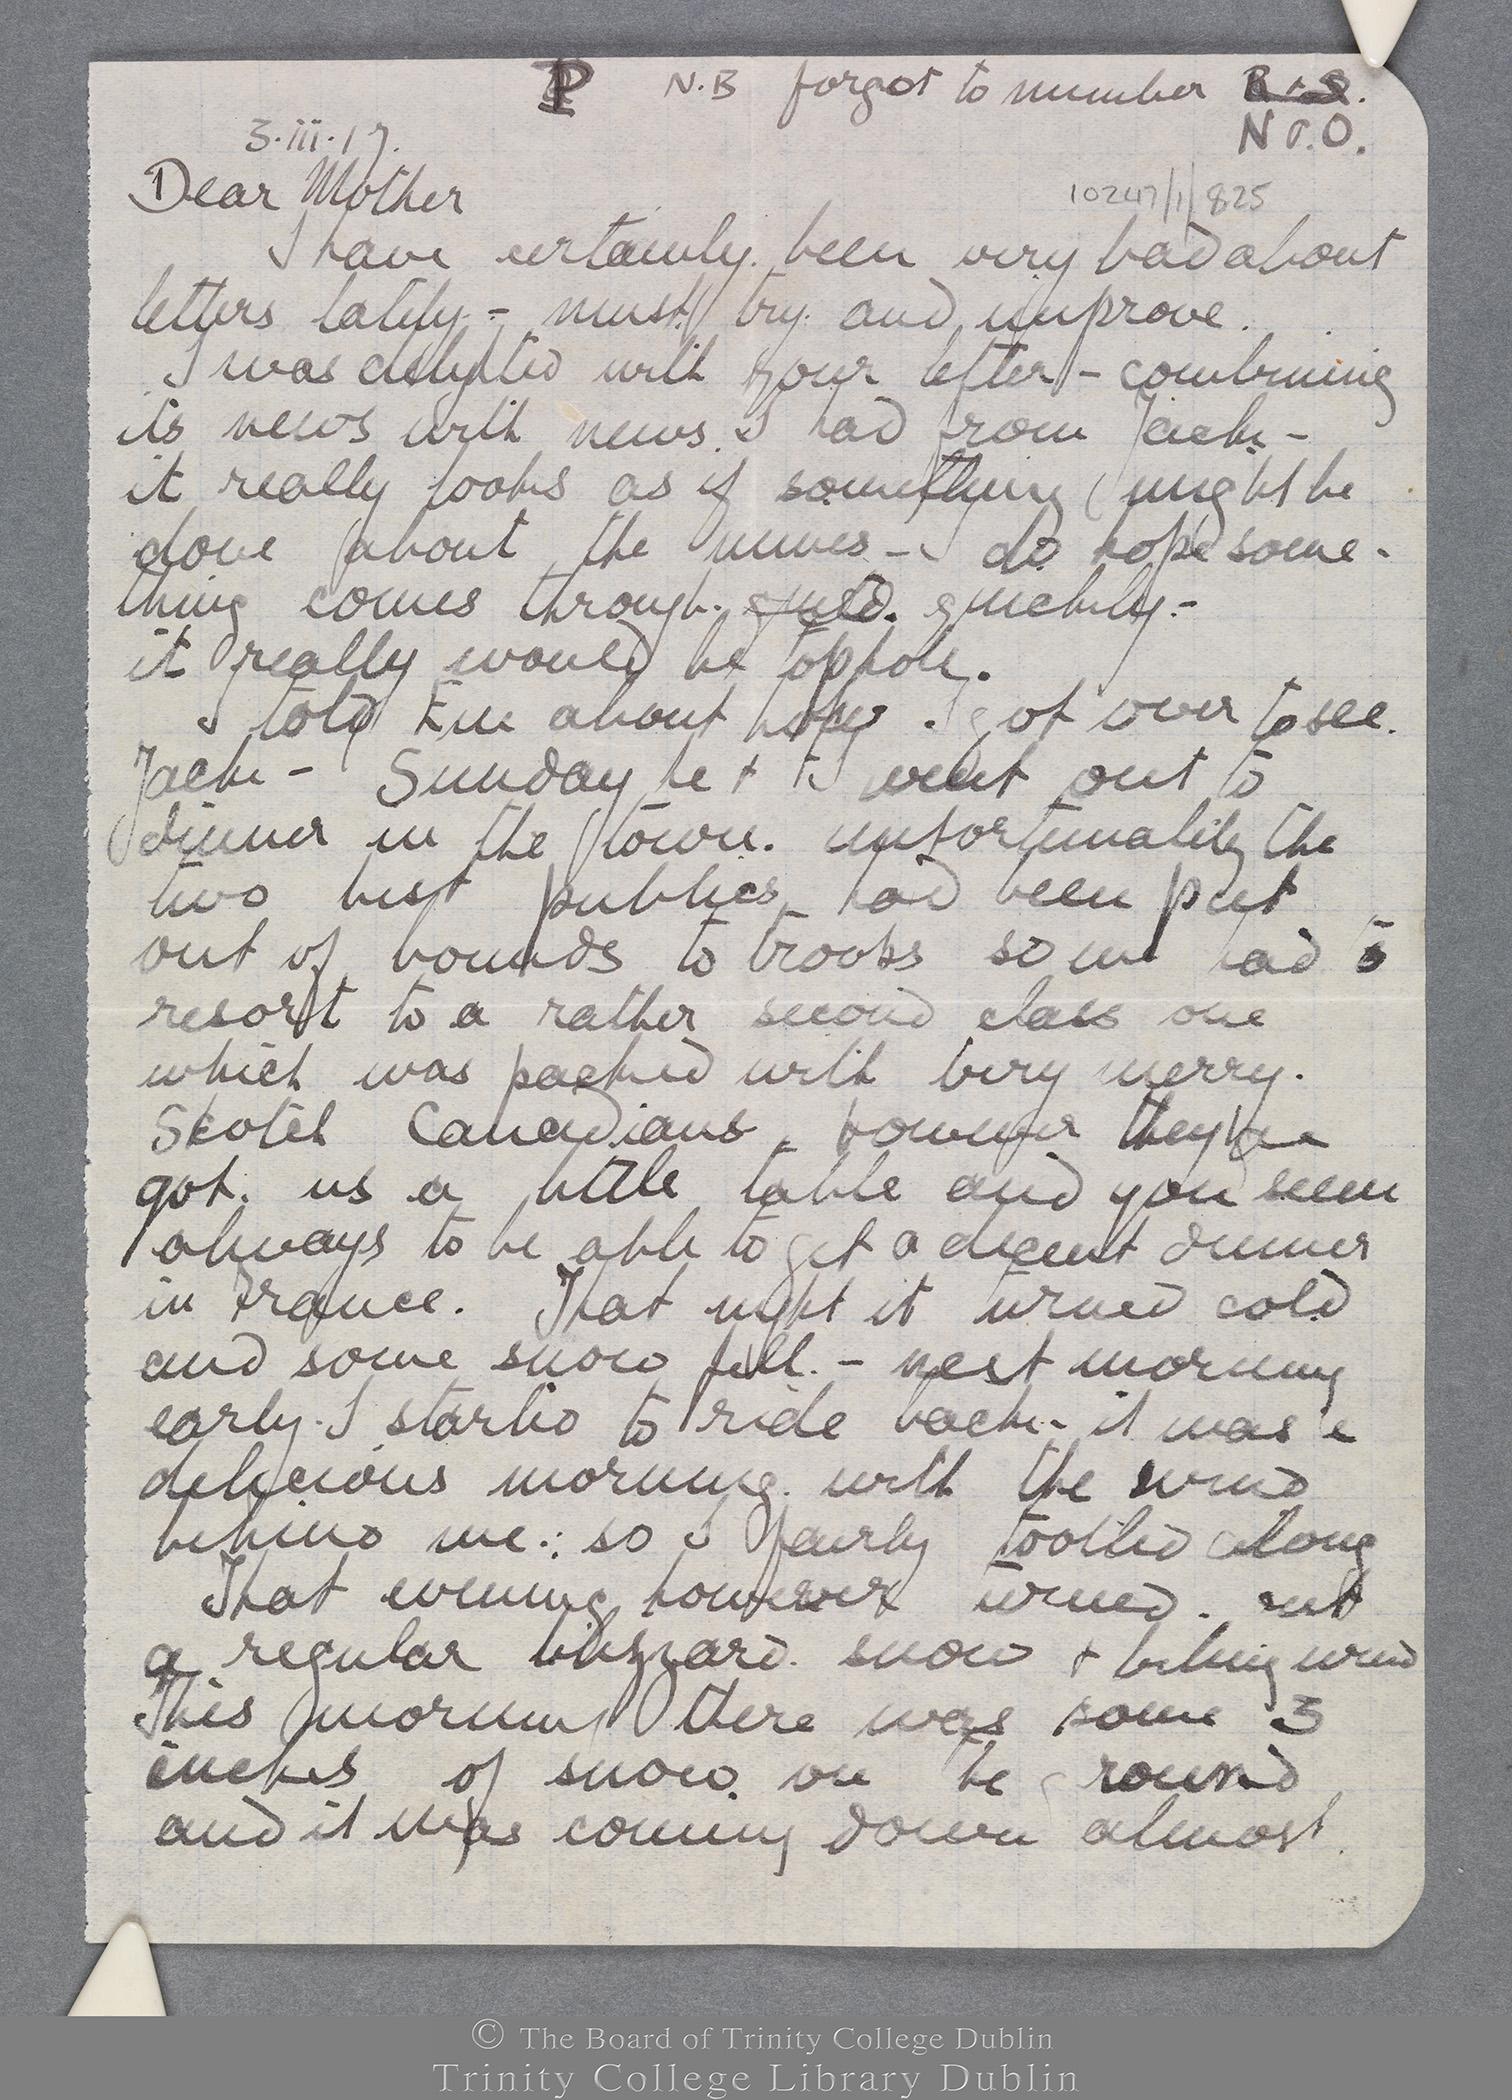 TCD MS 10247/1/825 folio 1 recto